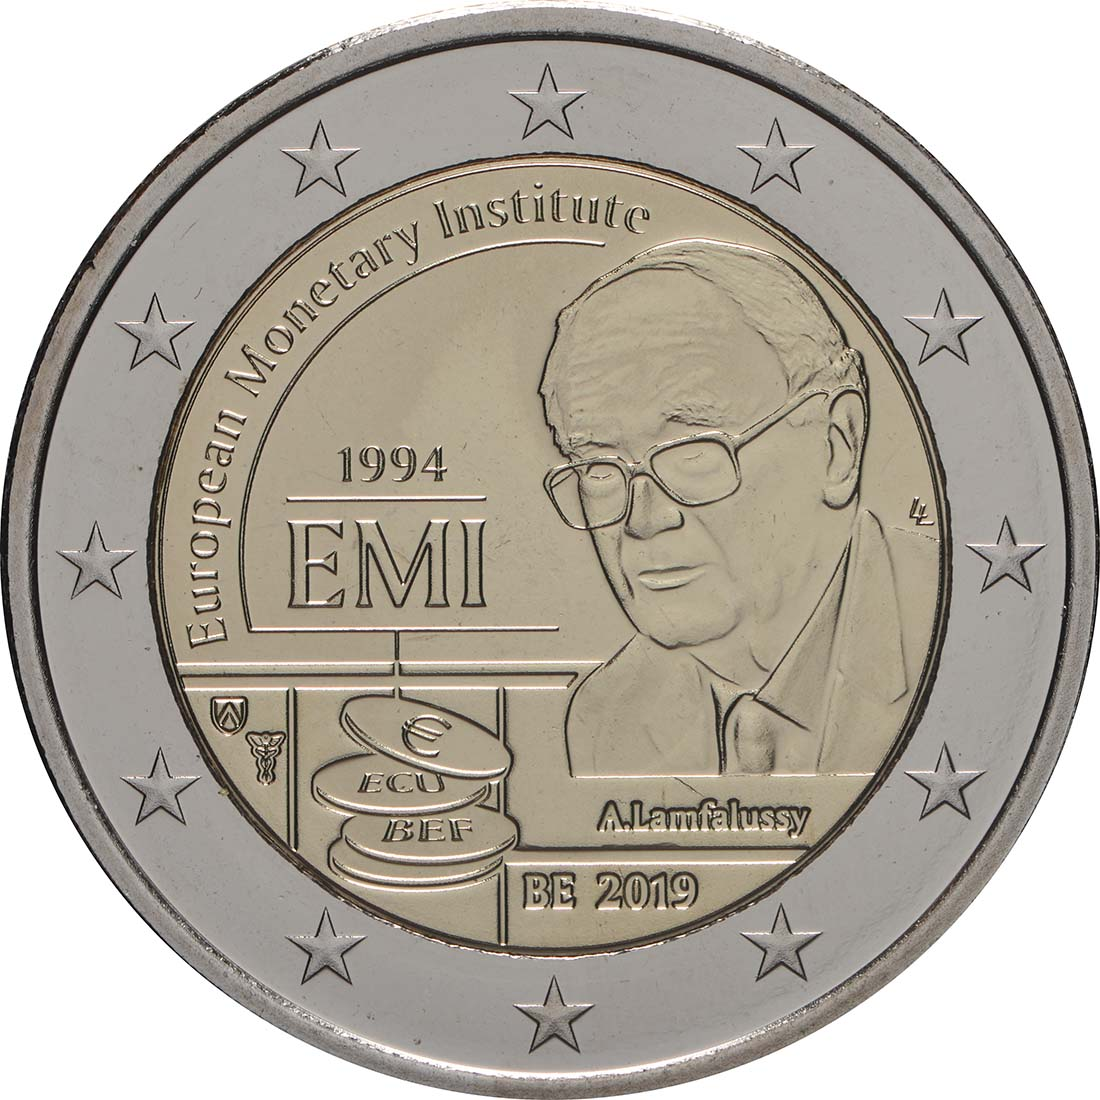 2019 343 Belgien 25 J. Europ. Währungsinstitut.jpg